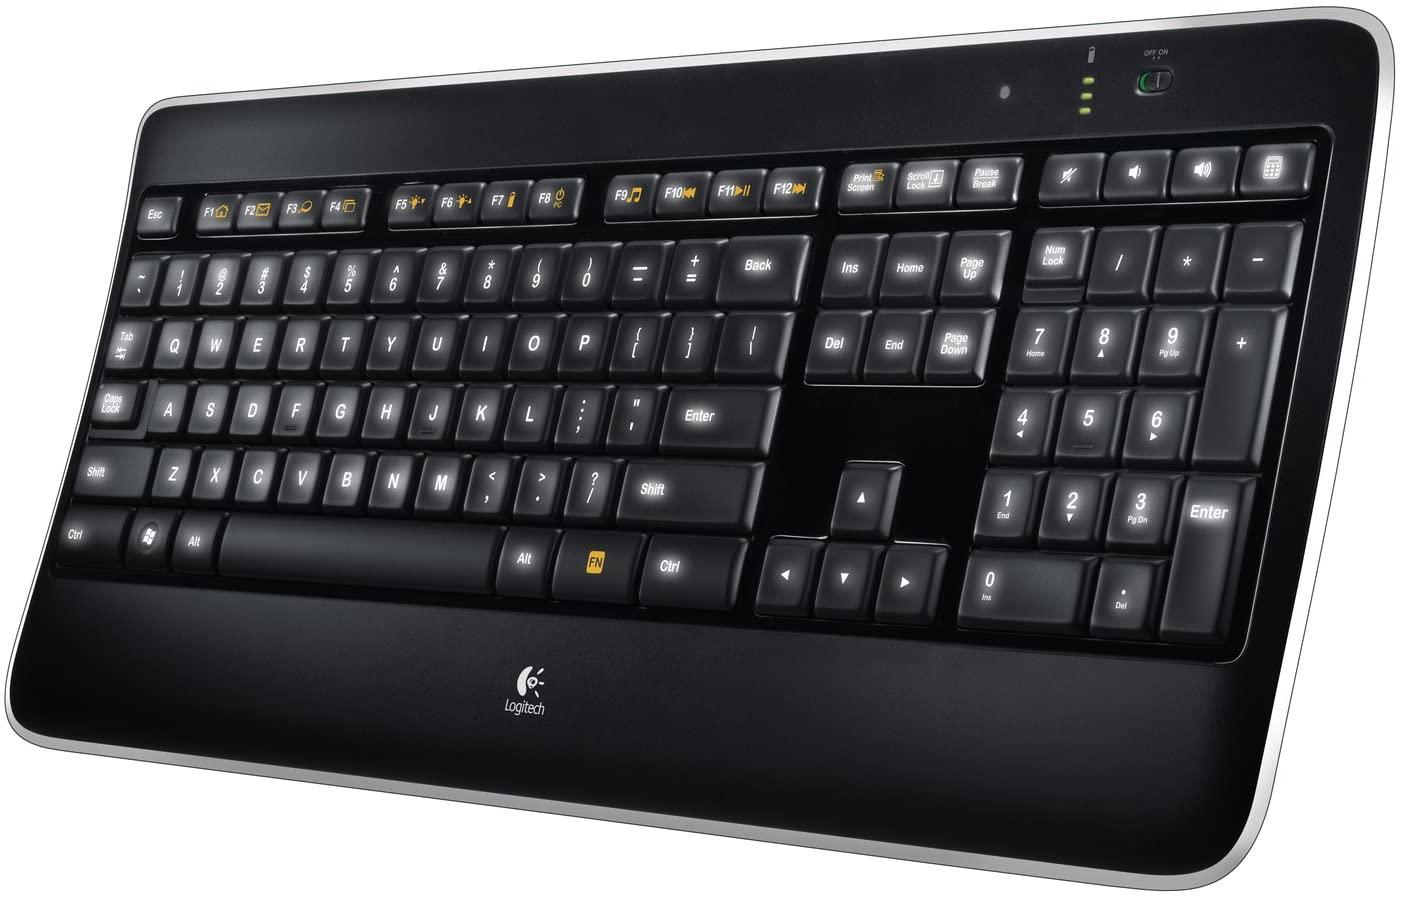 Logitech K800 Tastiera Wireless 2.4 GHz Retroilluminata per Windows, con Mini Ricevitore USB Unifying, Tasti Illuminati Laser PerfectStroke, Ricaricabile, PC/Laptop, Layout Italiano QWERTY, Nero